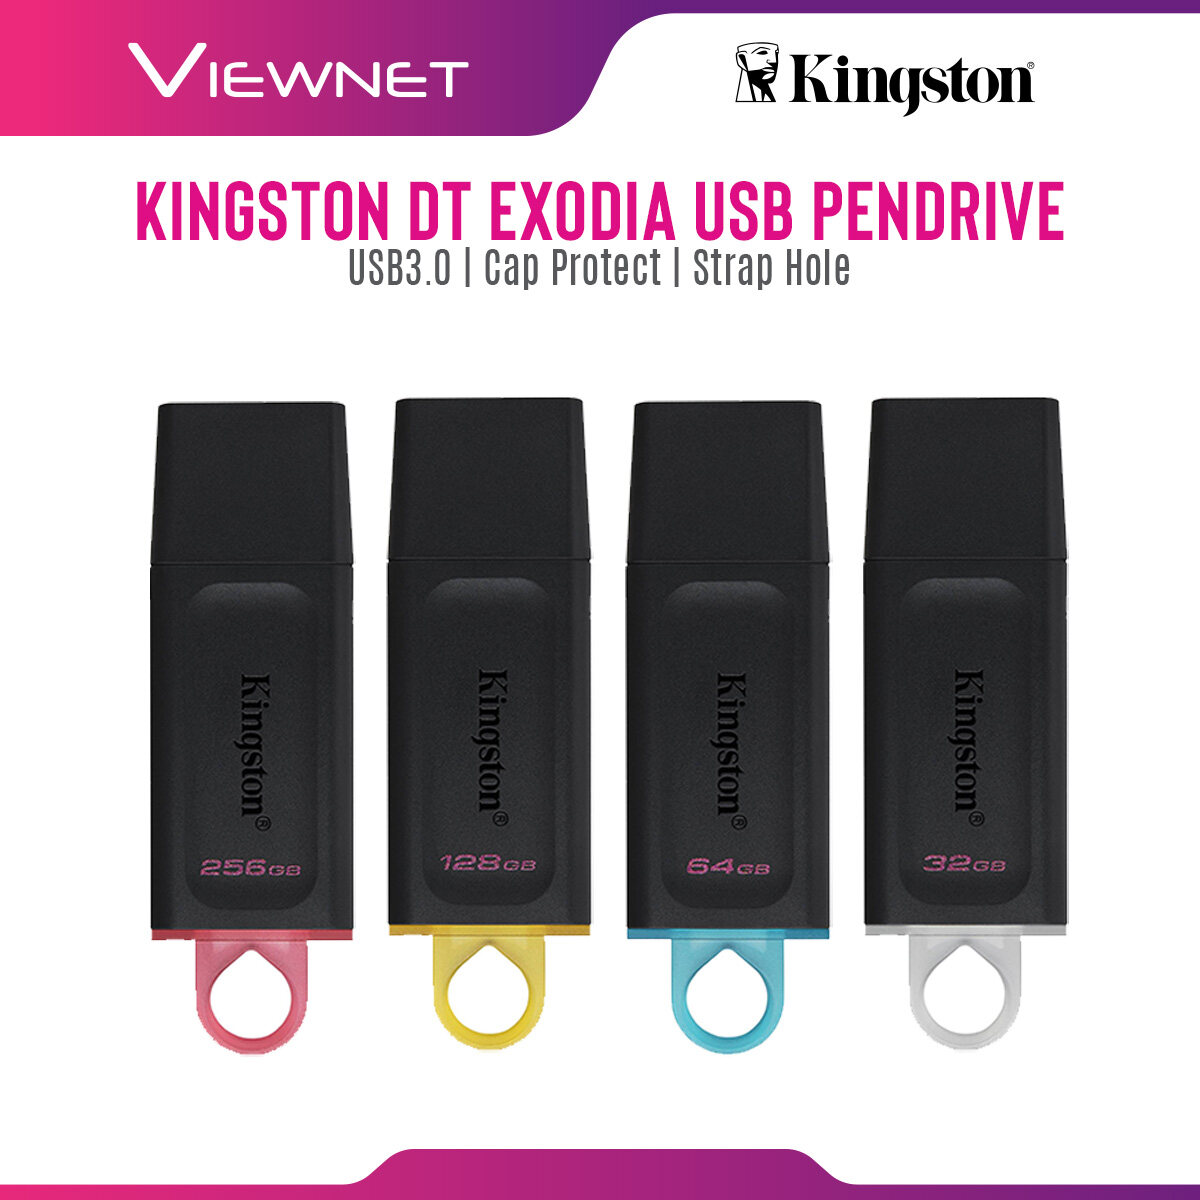 Kingston DataTraveler Exodia USB Flash Drive with USB 3.2 Gen1 1 Transfer Speed, Strap Hole, Cap Protect, Plug and Play (32GB / 64GB / 128GB / 256GB)